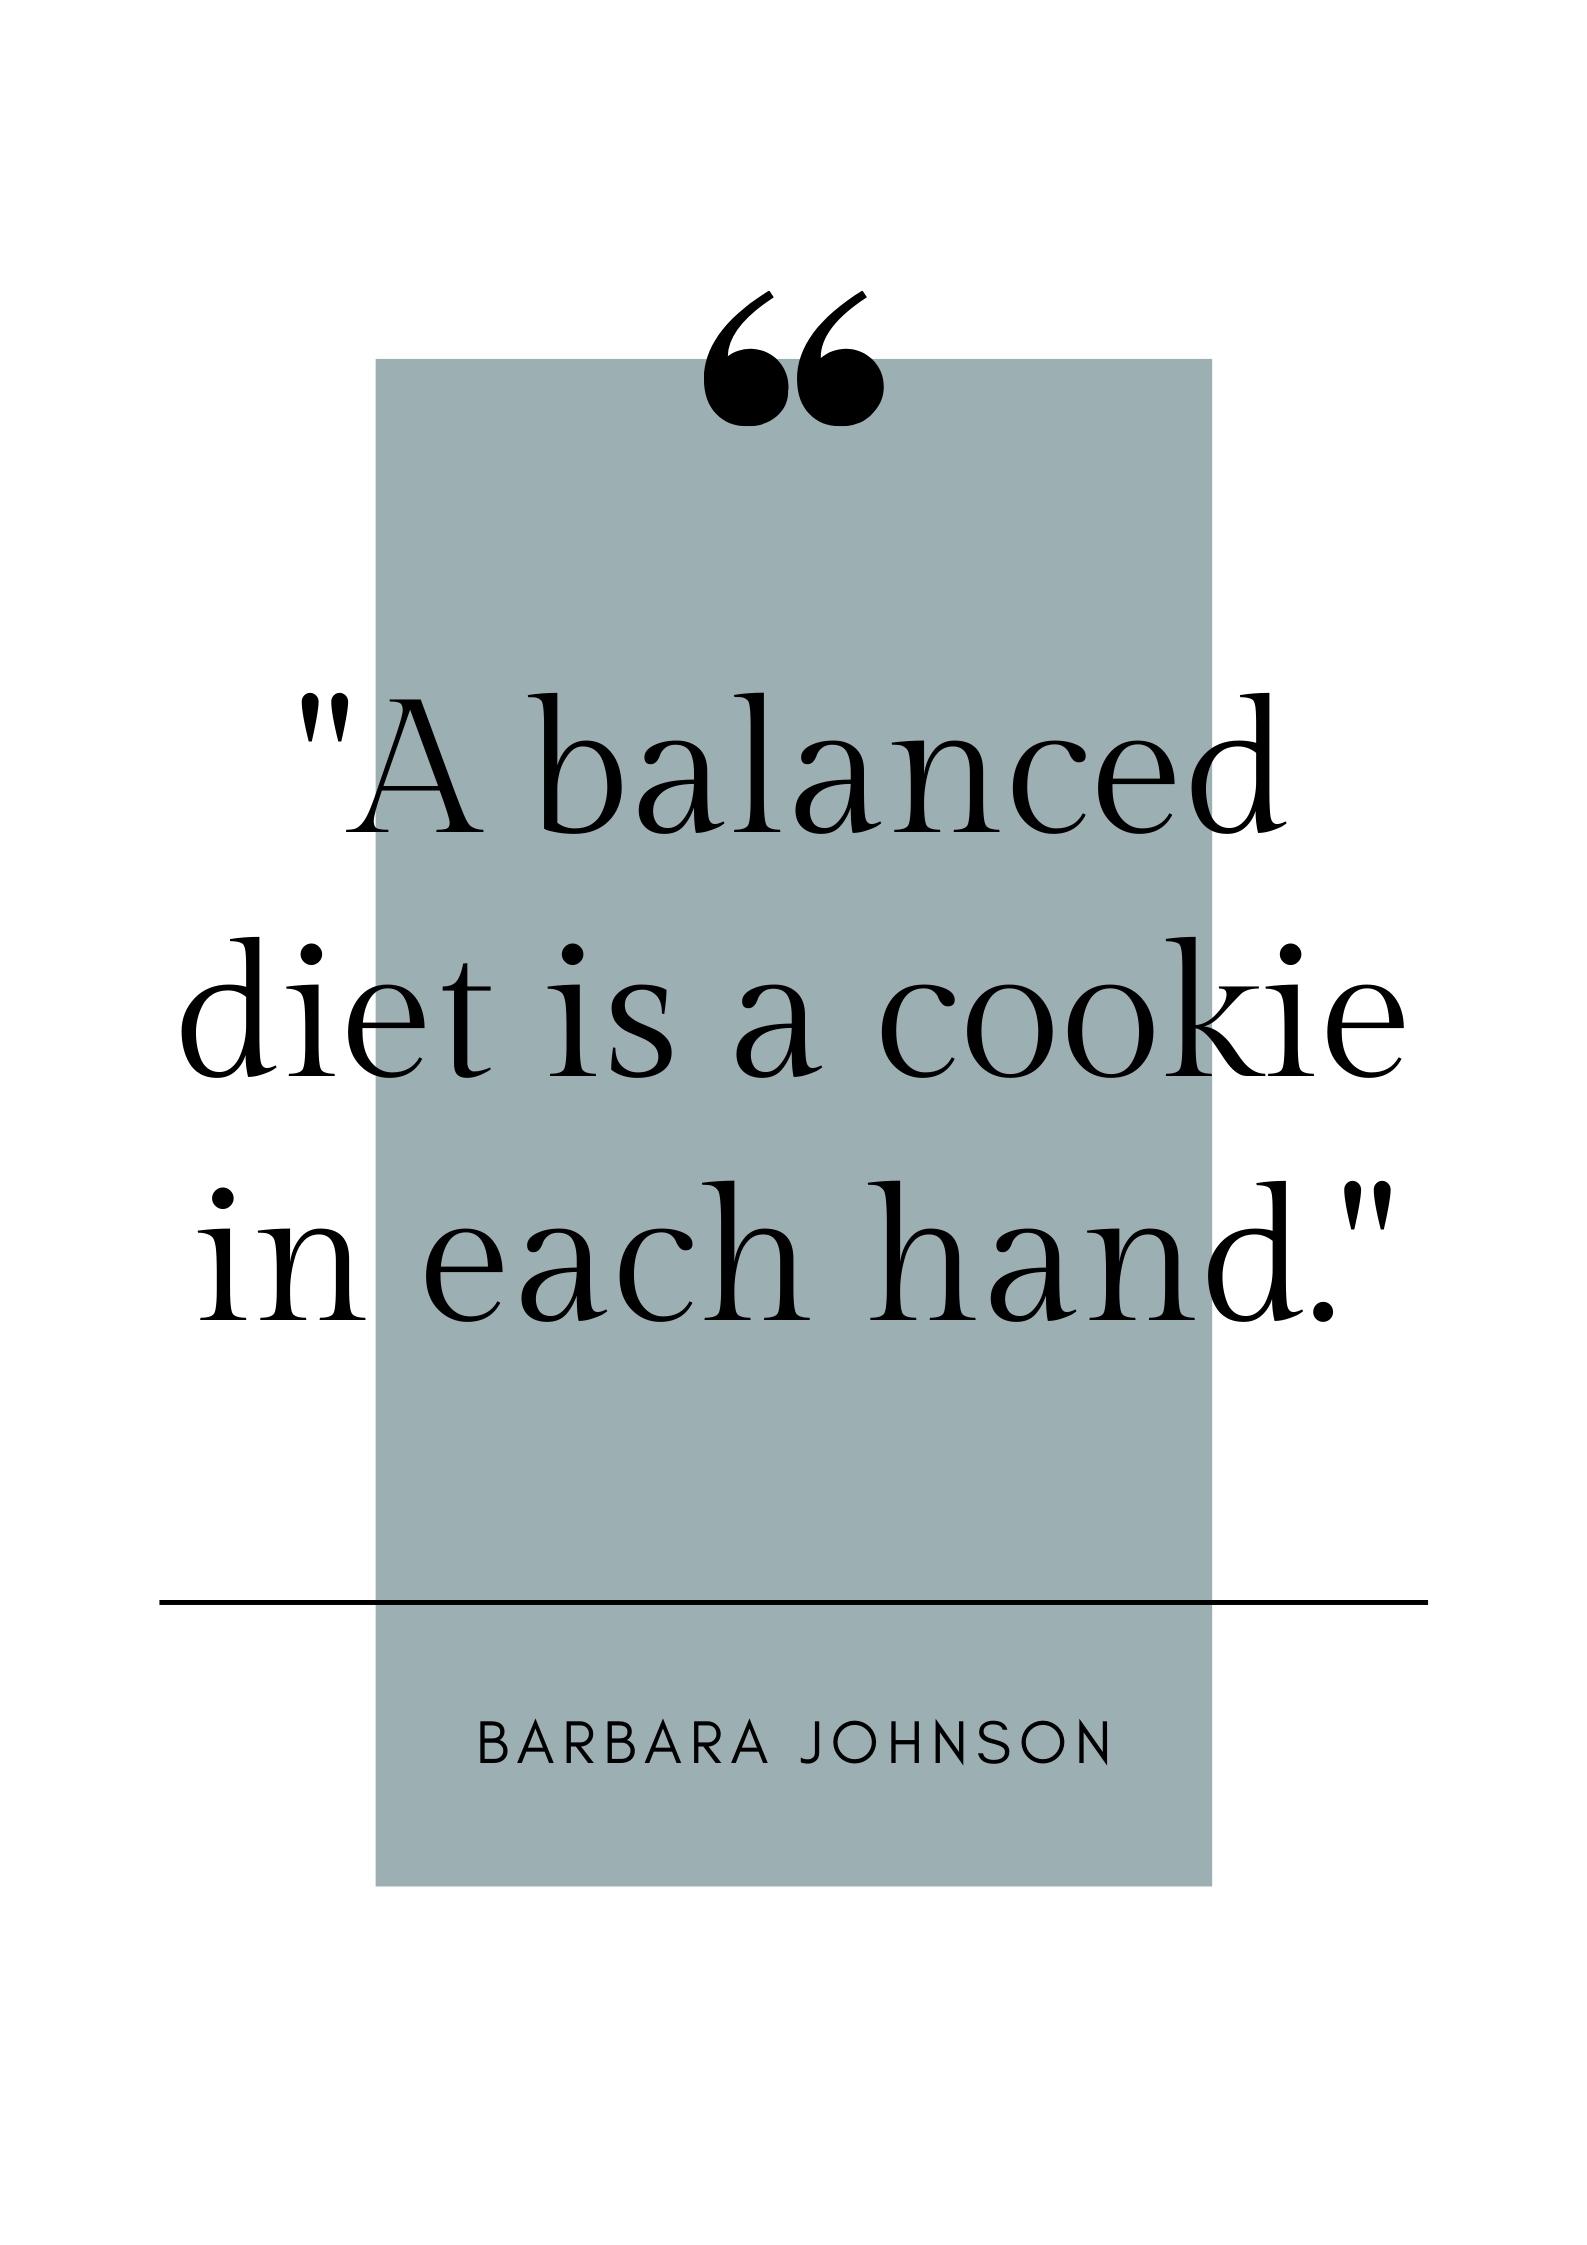 barbara johnson cookie quote